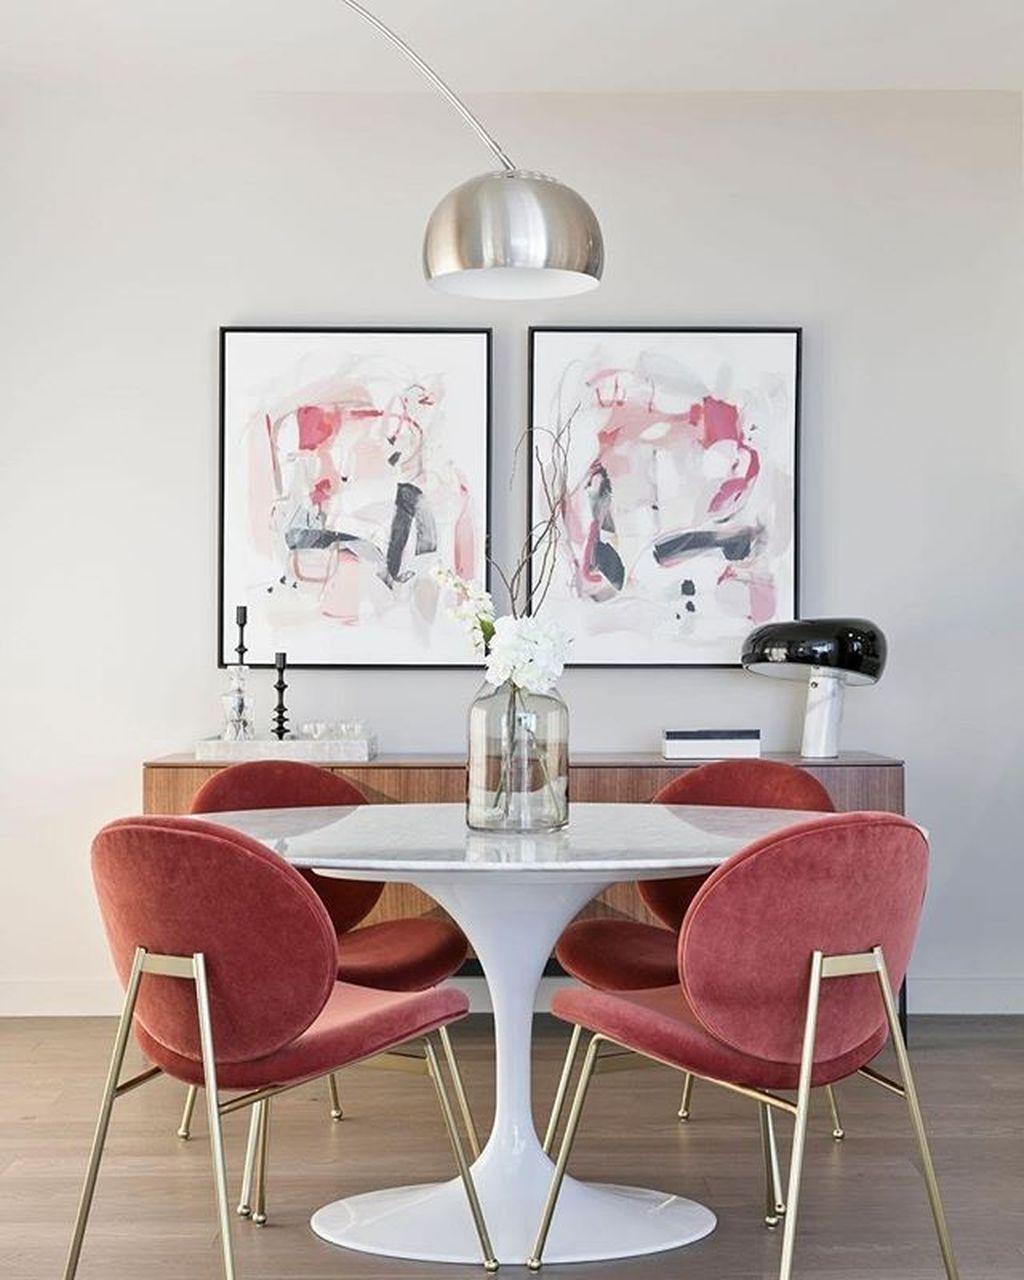 44 Stylish Dining Chairs Design Ideas Homyhomee Luxury Dining